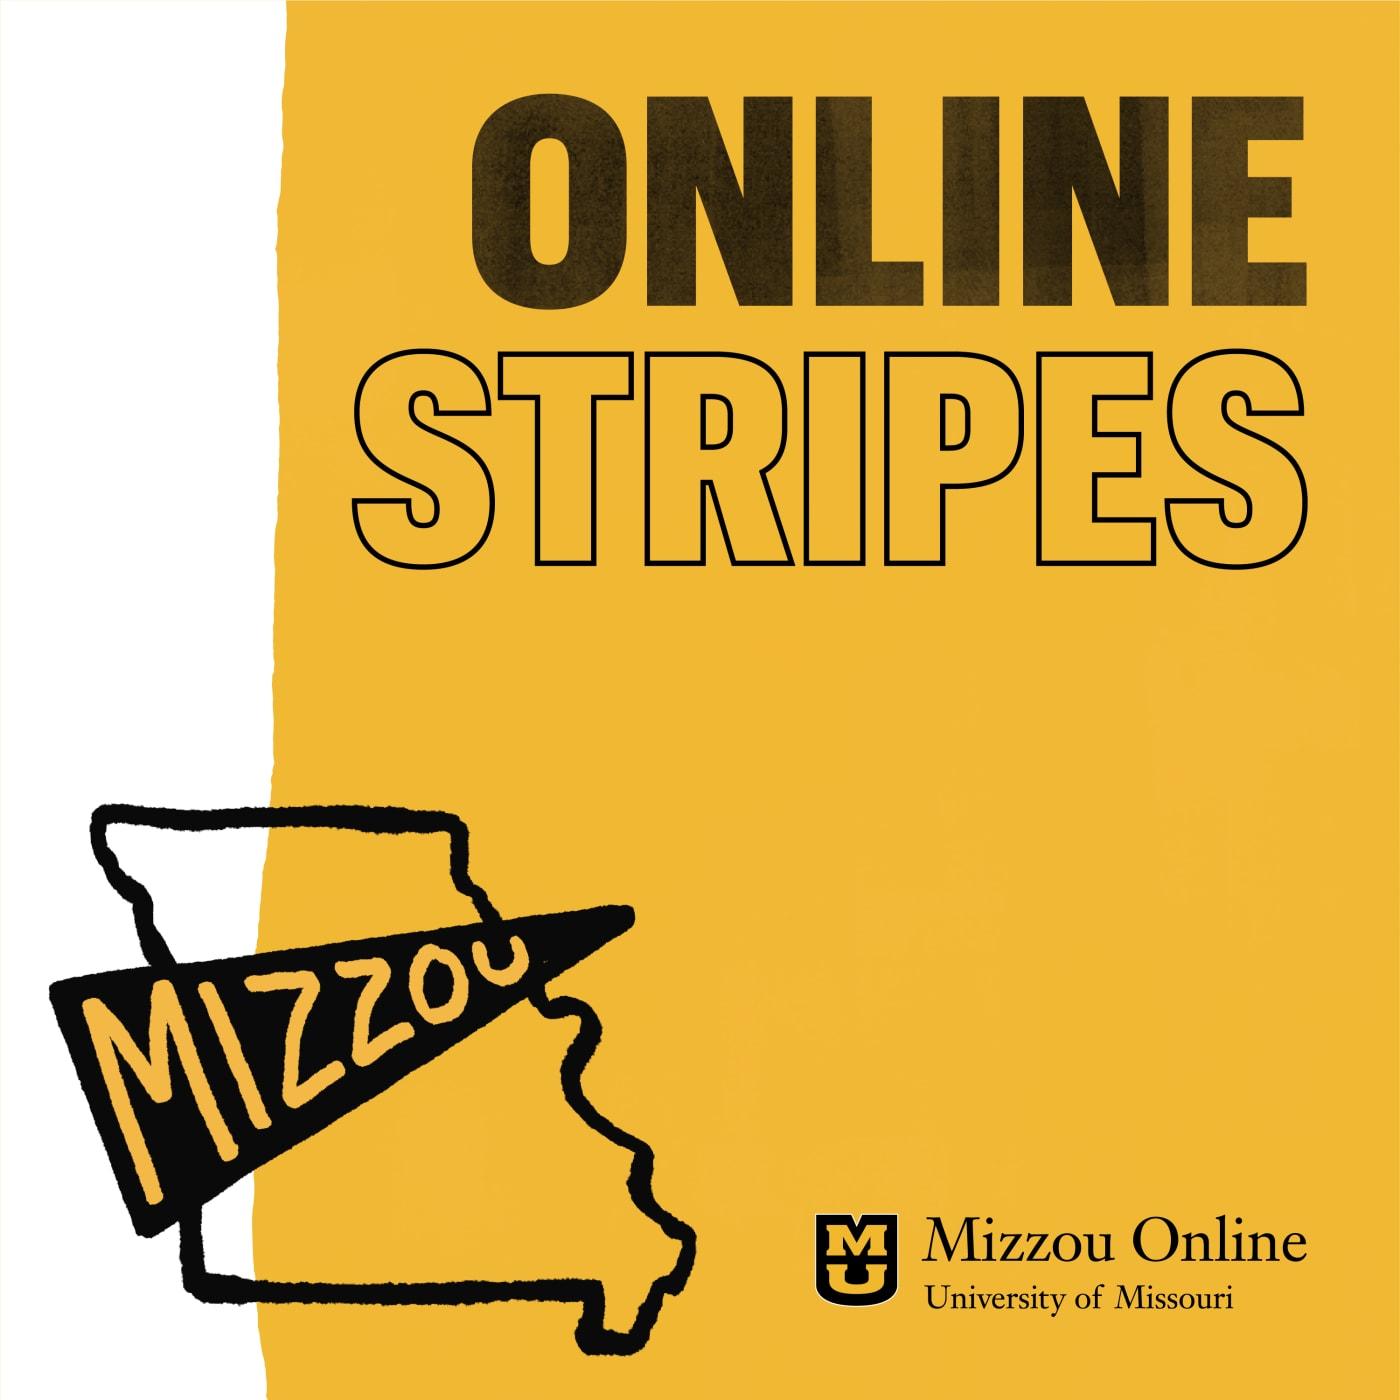 Online Stripes logo